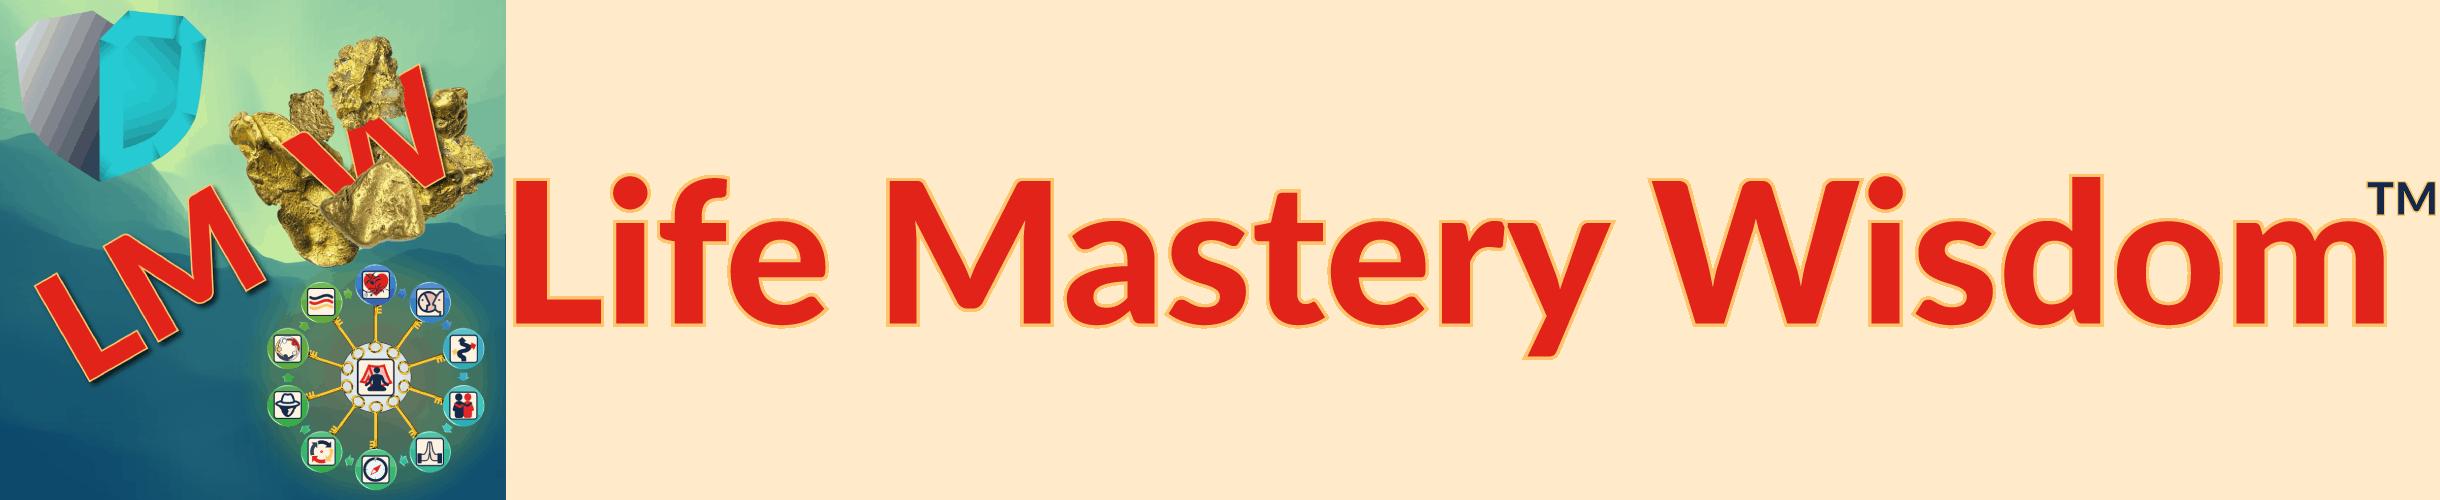 Life Mastery Wisdom